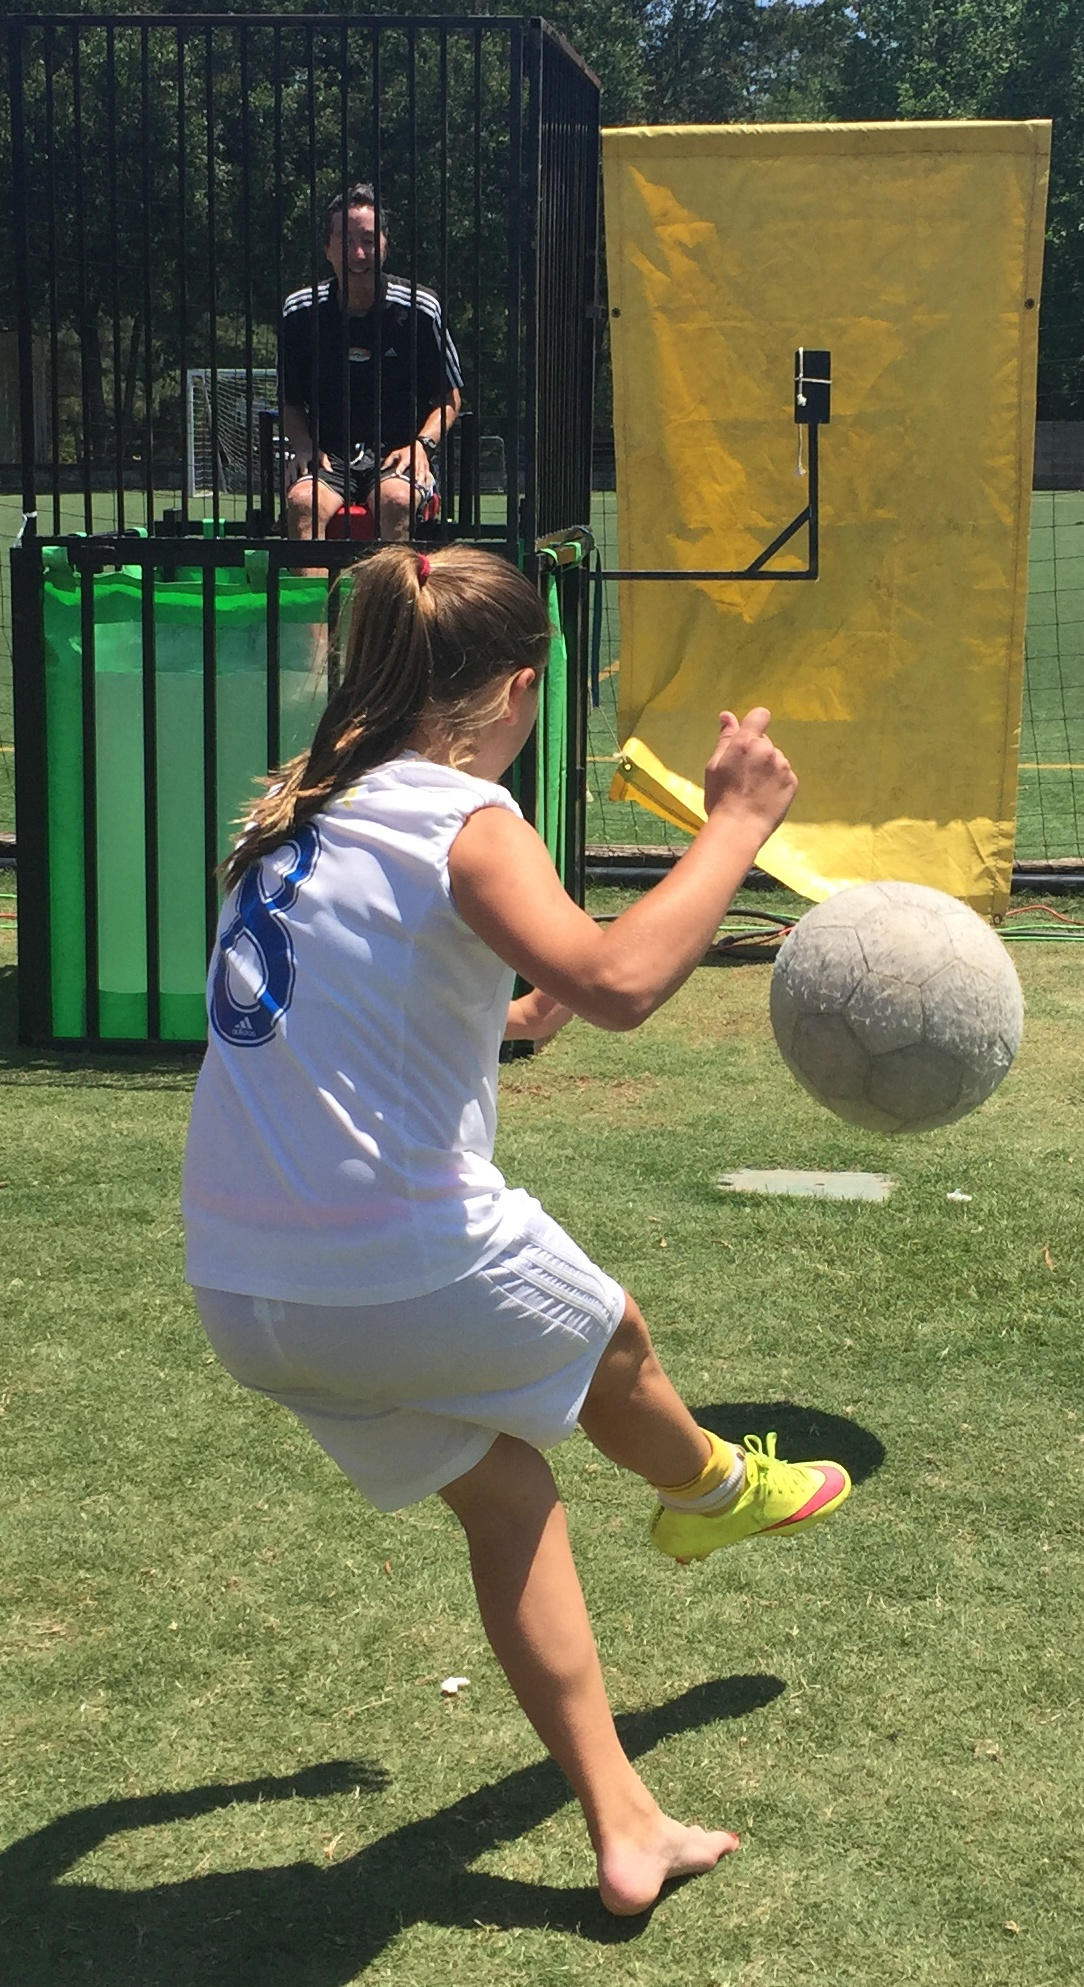 nasa soccer girls - photo #33